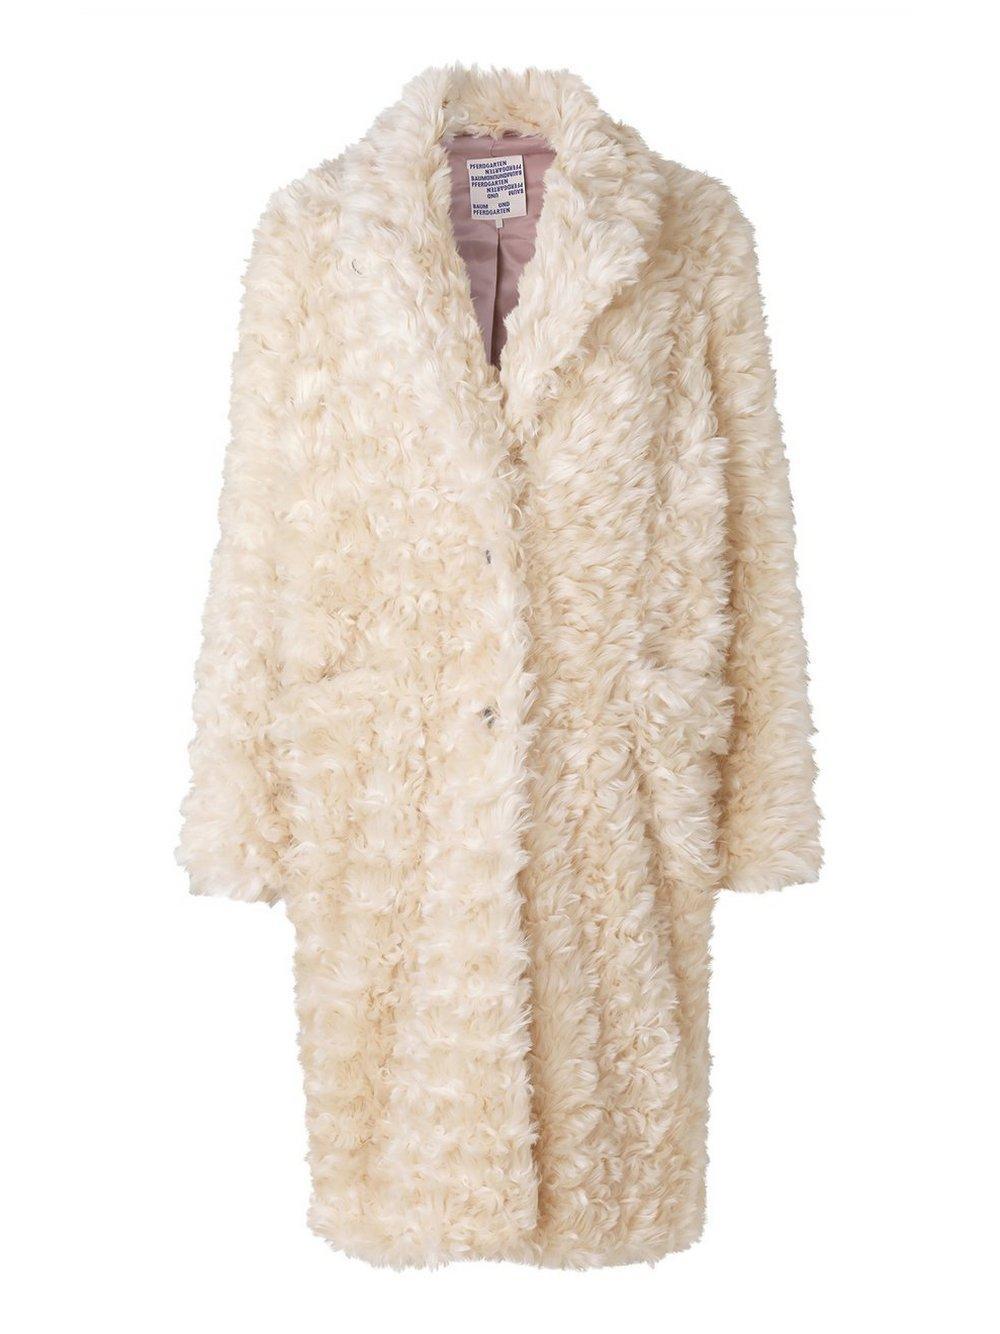 Dary Faux Fur Overcoat Item # 21346